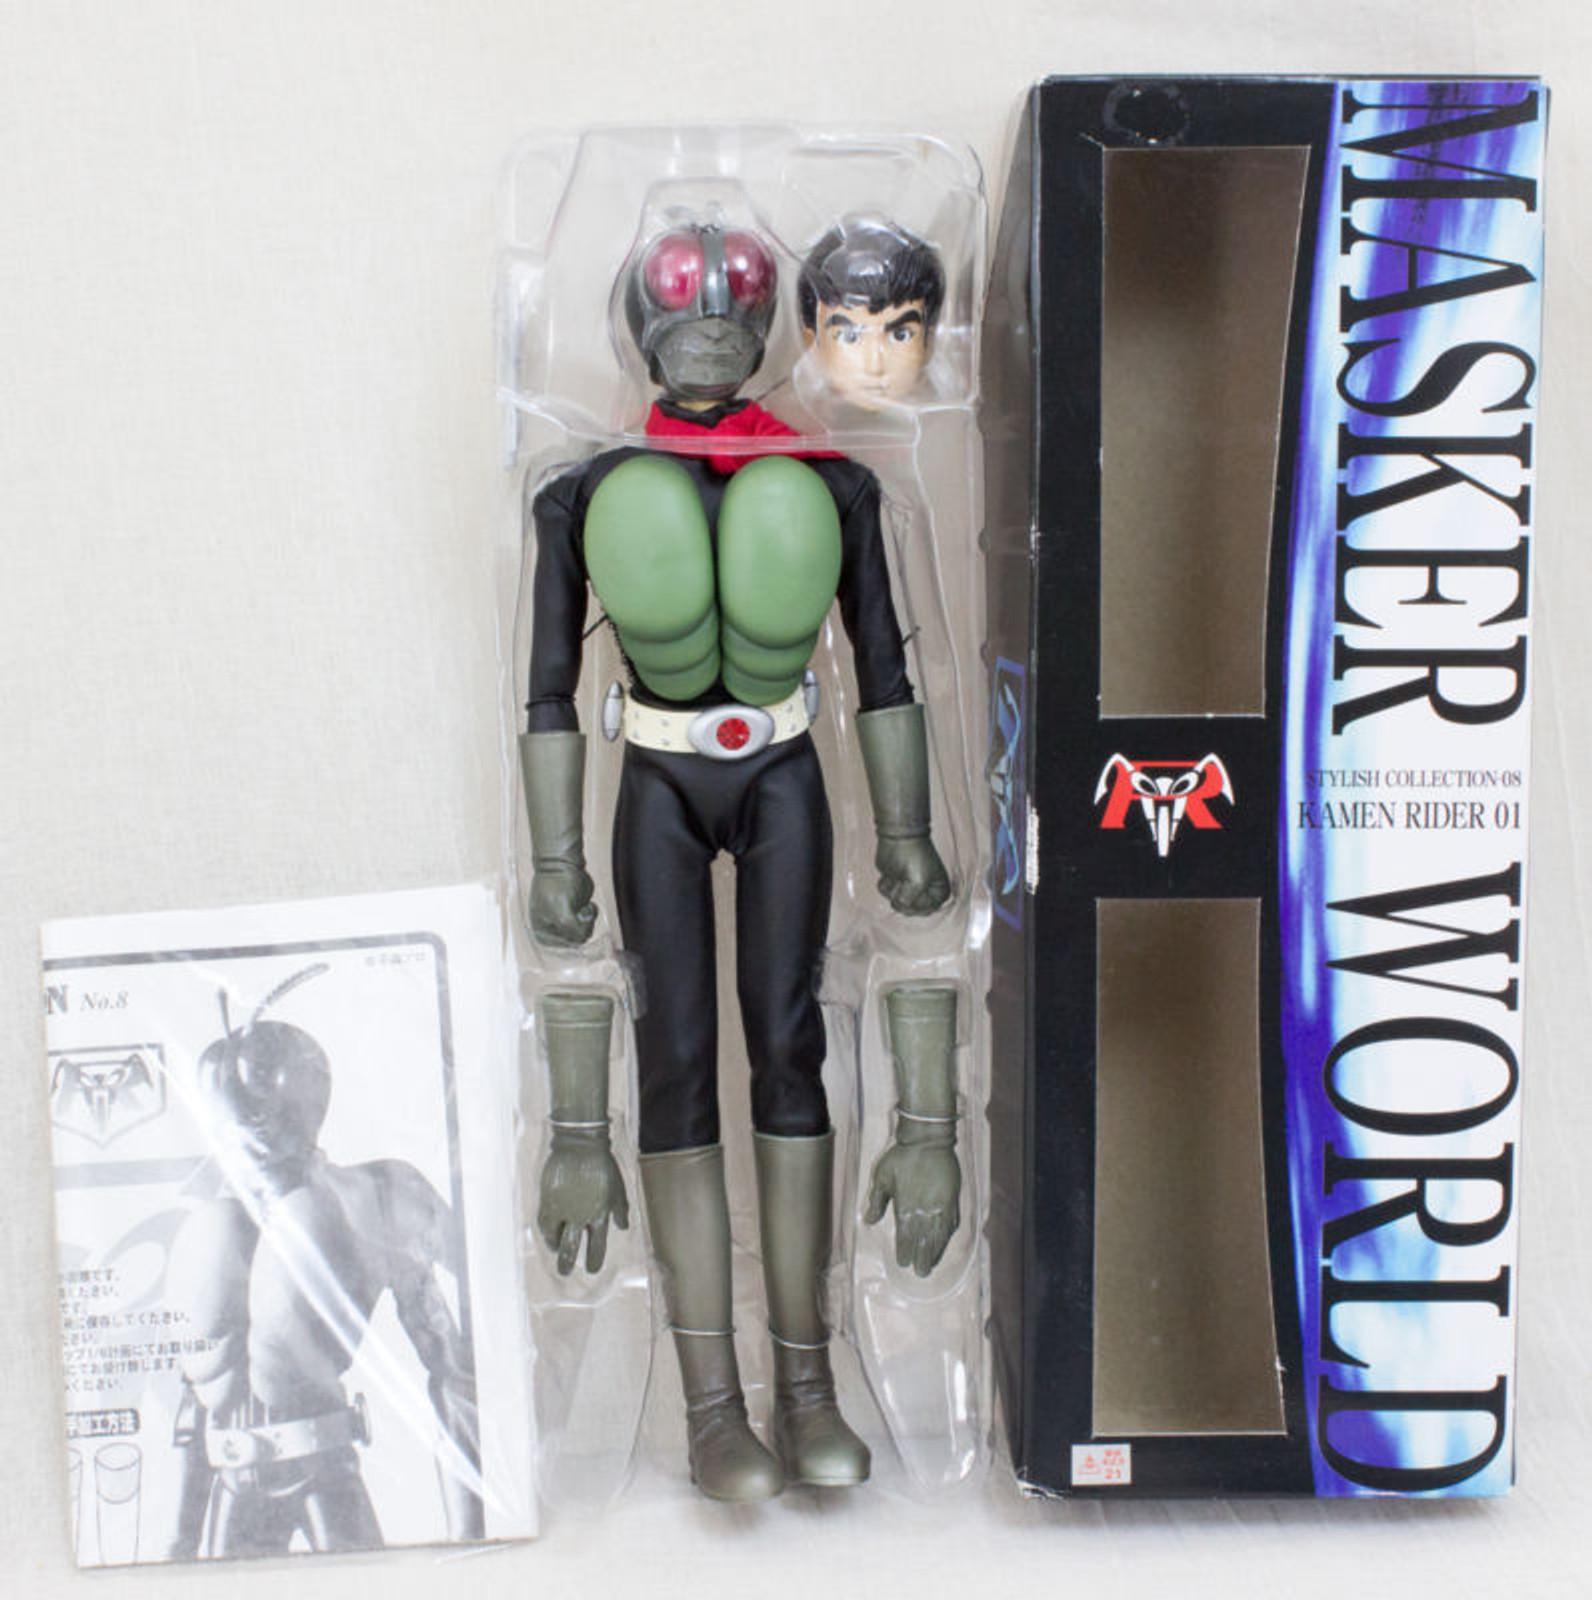 Kamen Rider 01 Stylish Collection Figure 08 Masker World Medicom Toy JAPAN